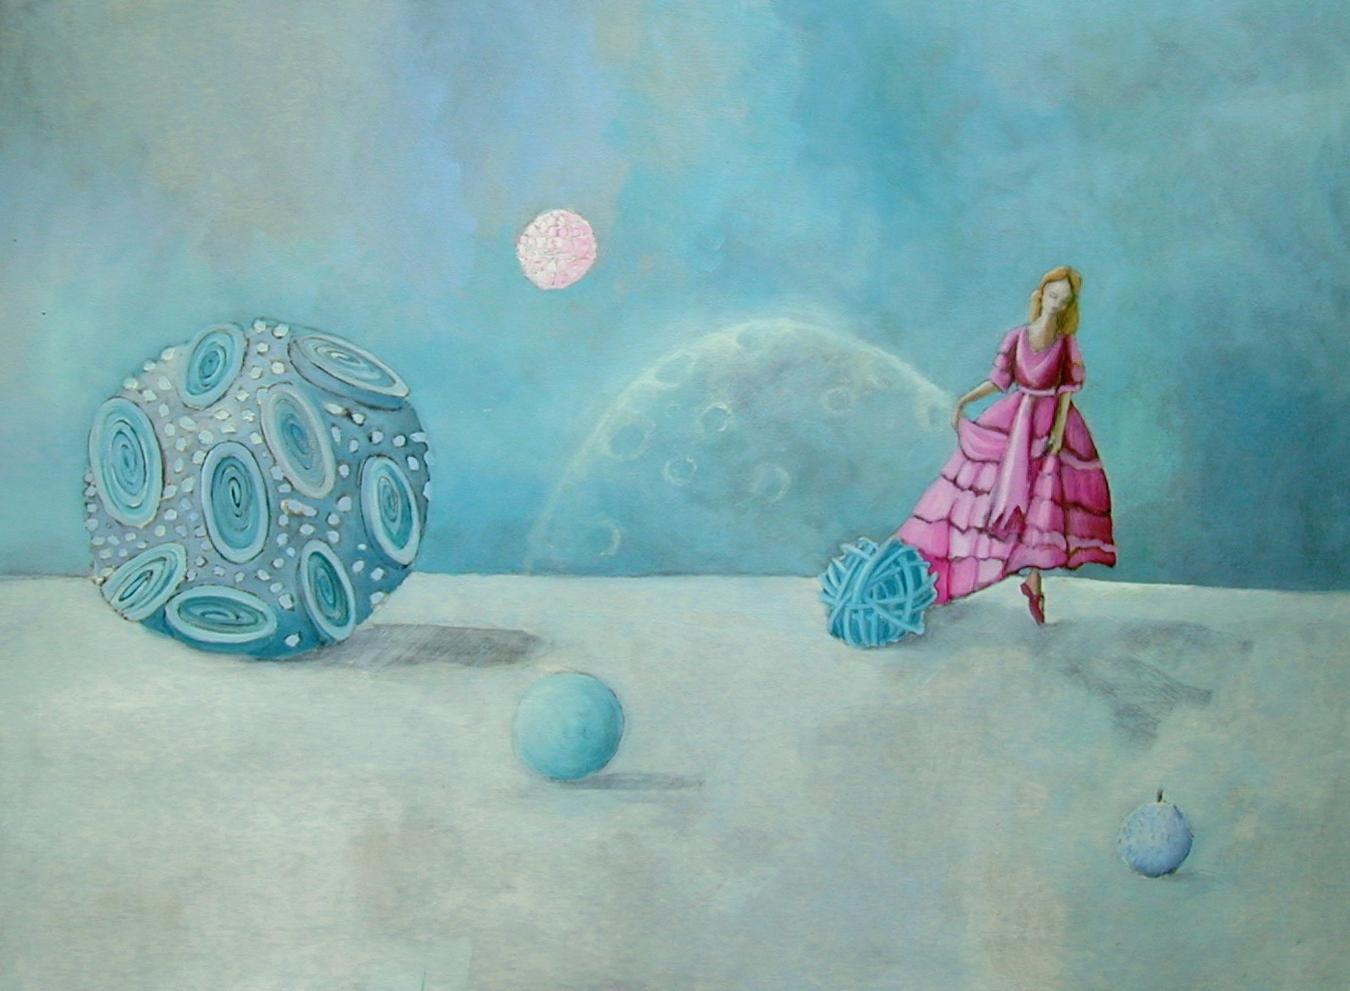 [My+blue+dream,+oil+on+canvas,+40+x+60+inches.JPG]